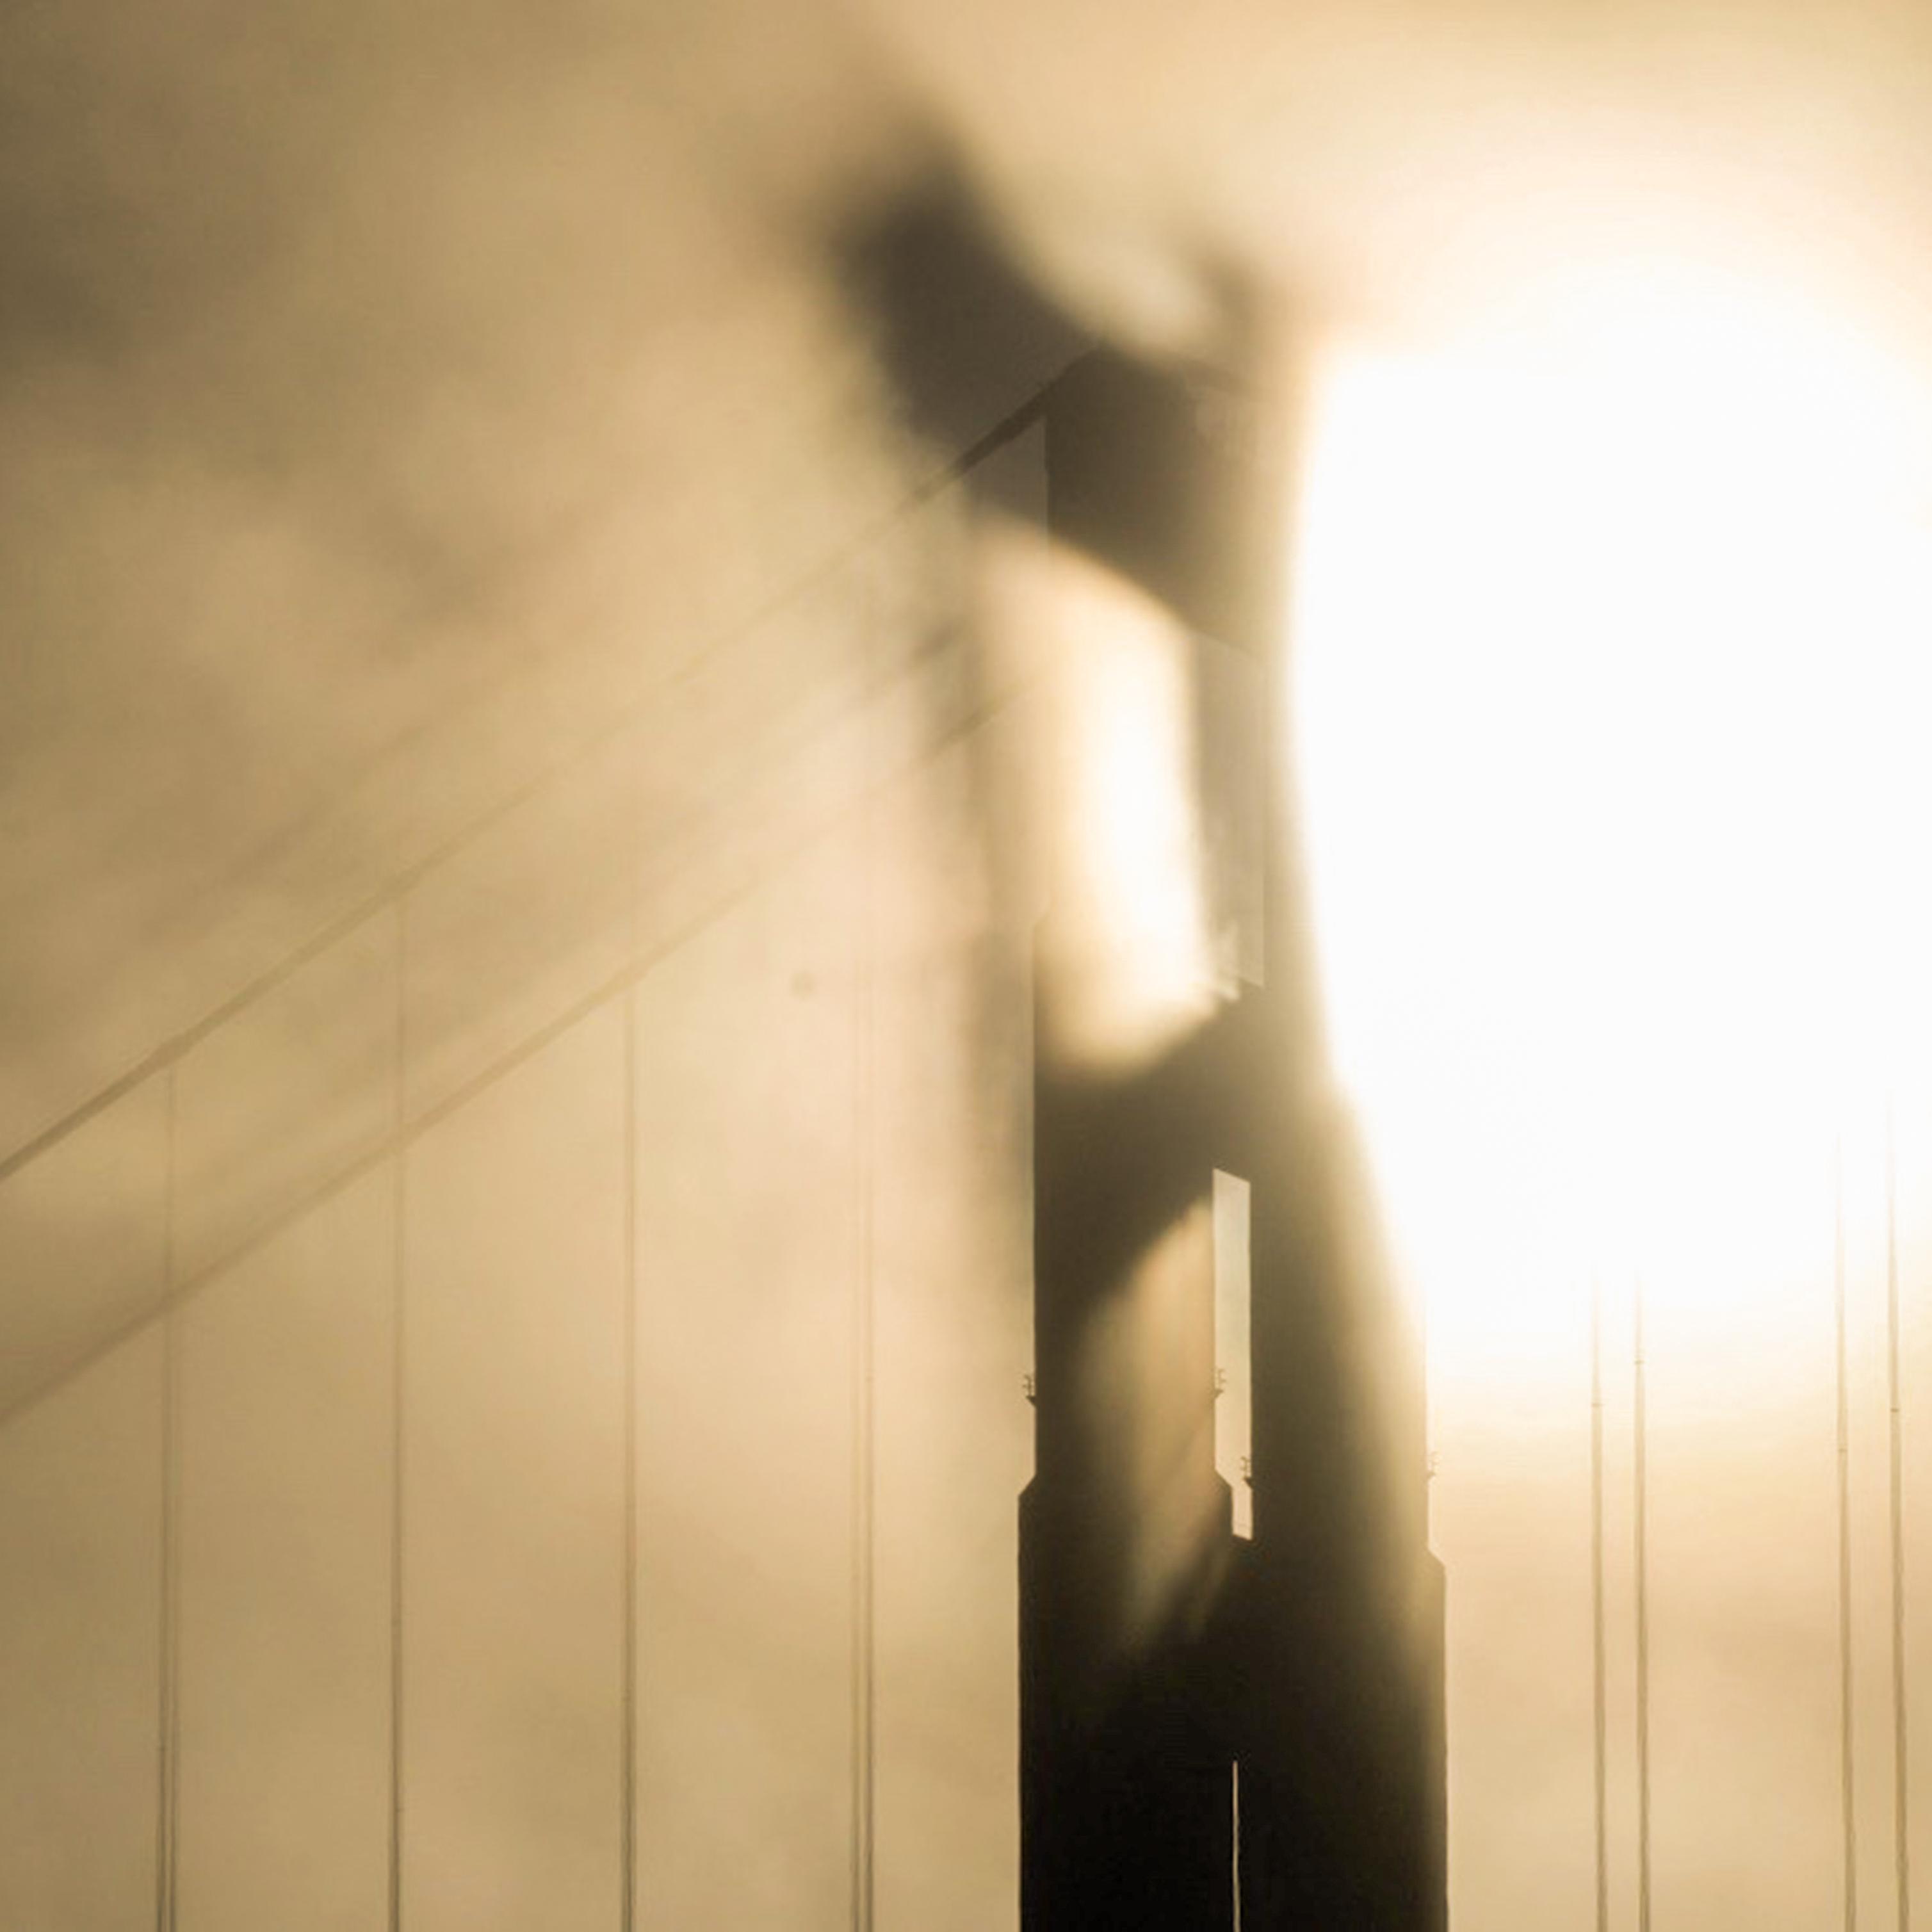 #fogbendsbridge by Rebecca Johnson